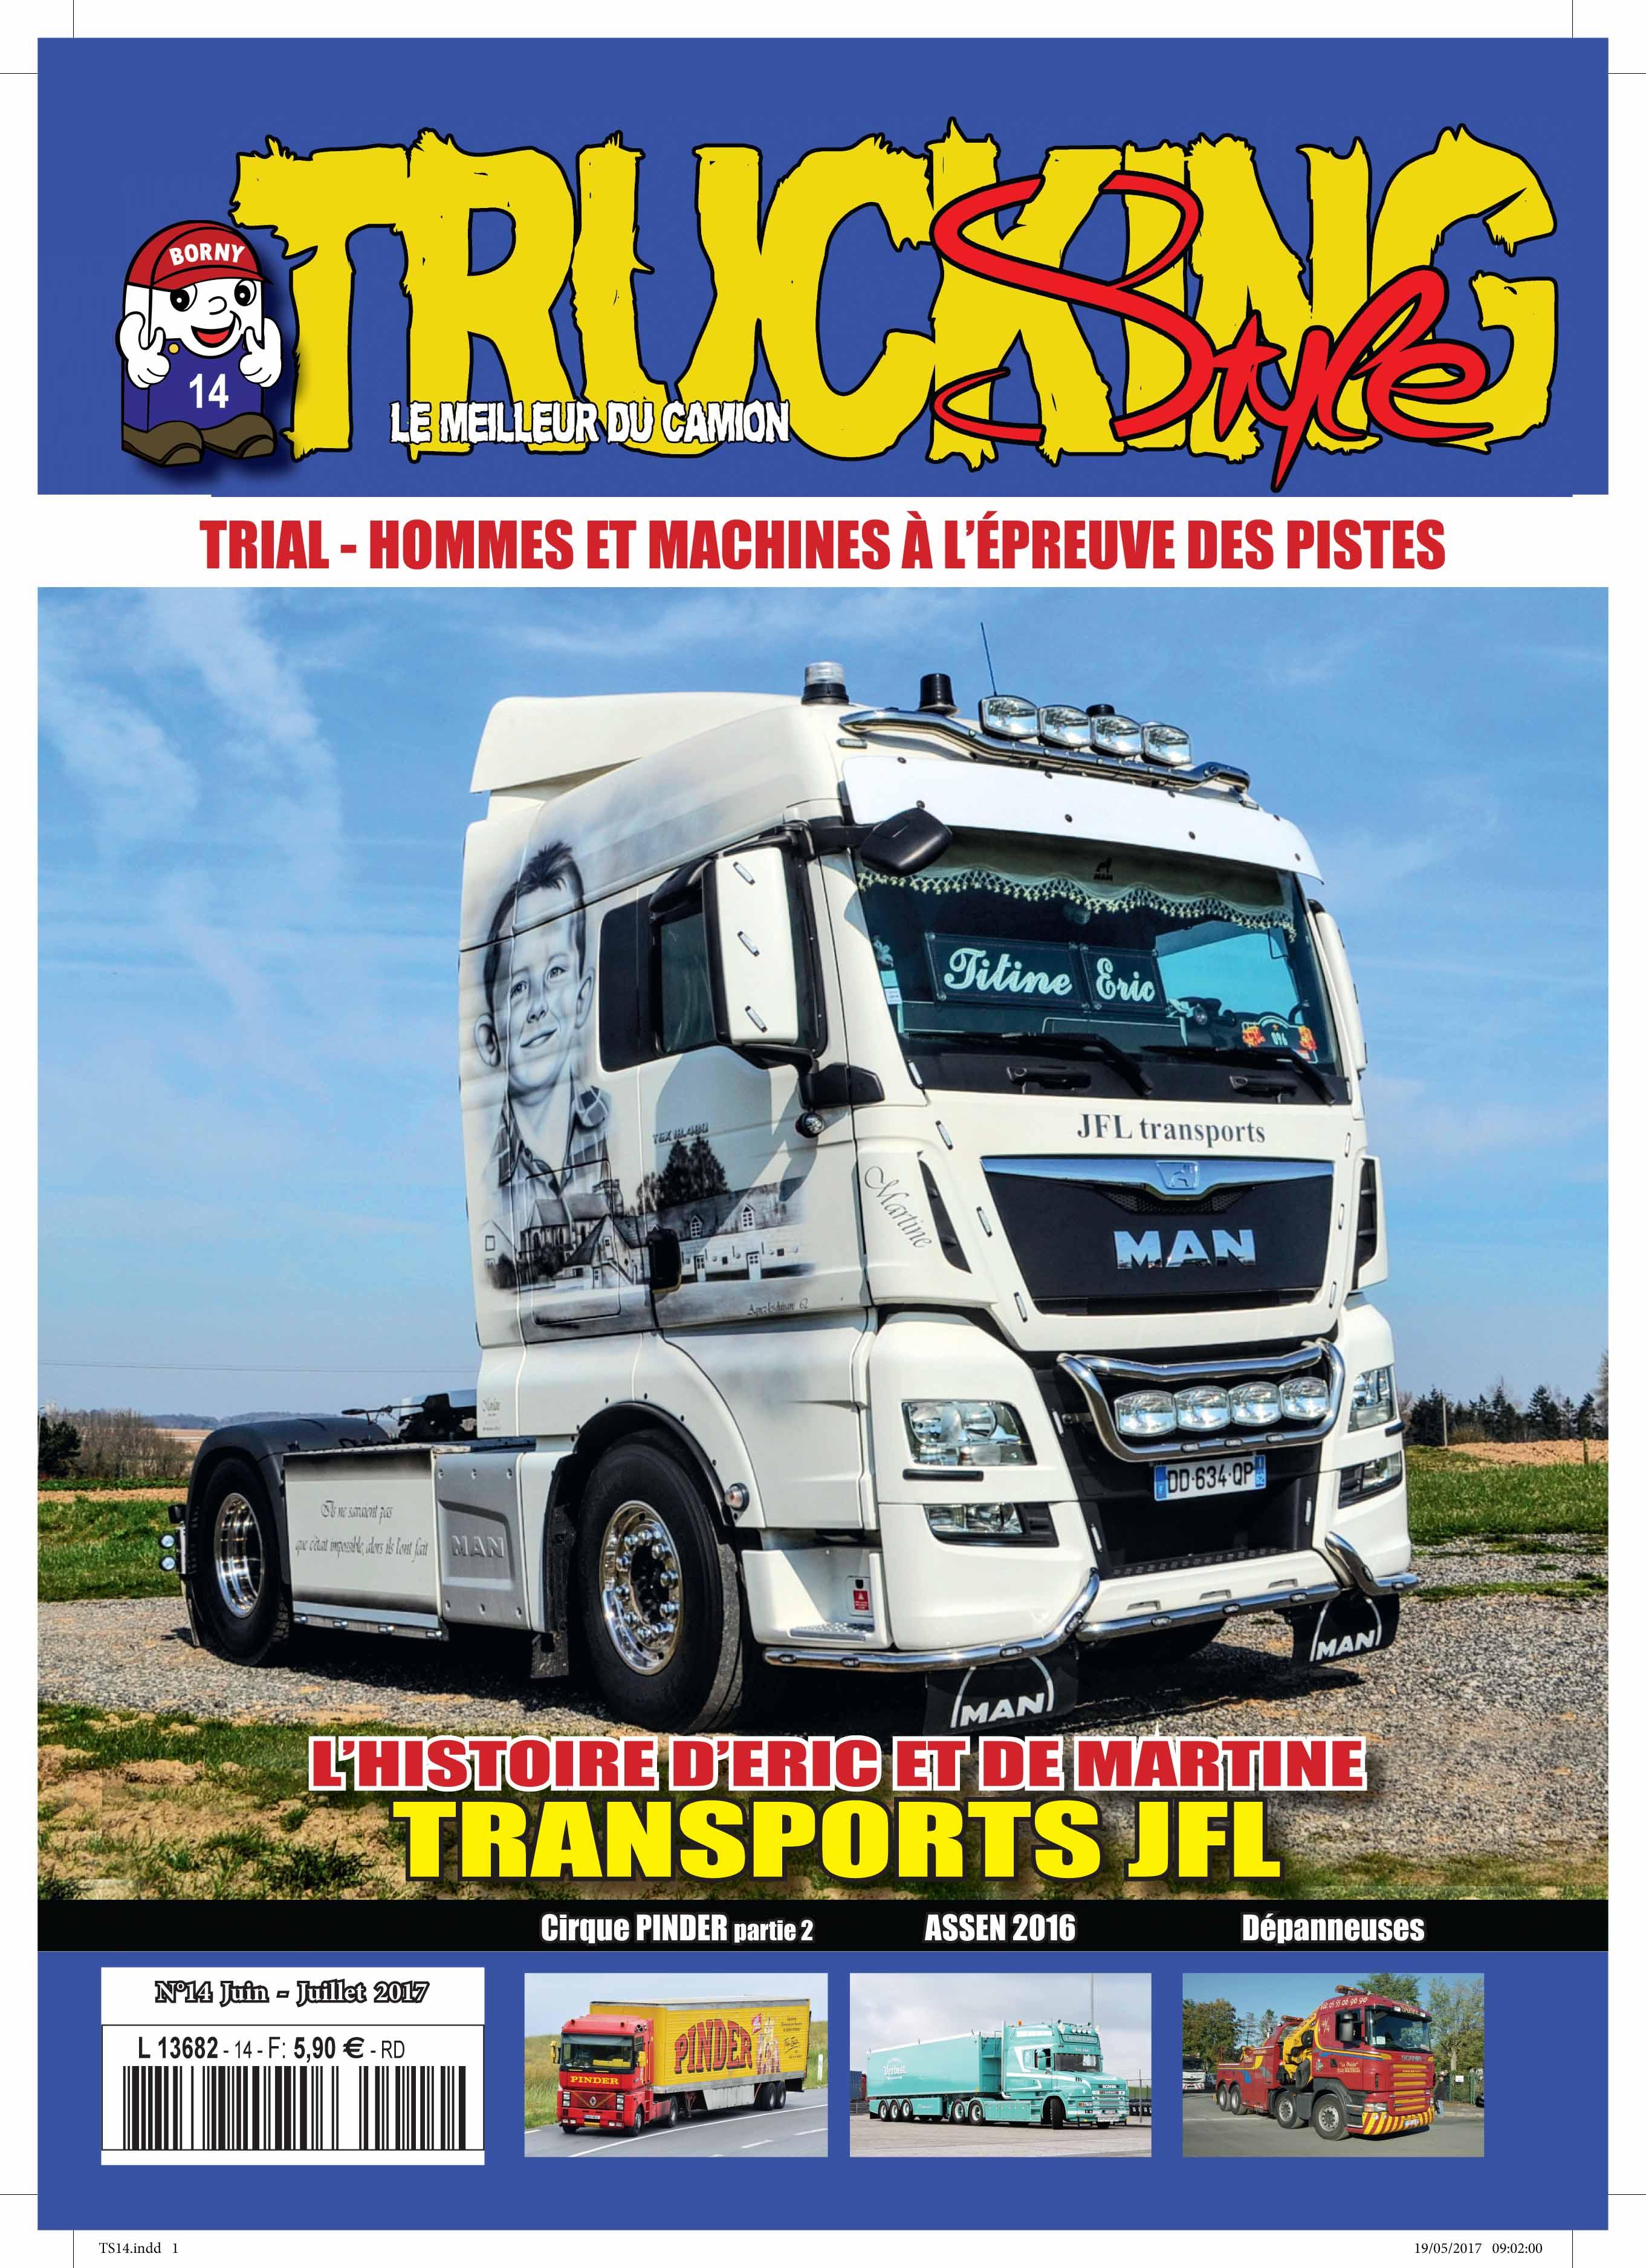 Numéro 14 de Trucking Style - Juin - Juillet 2017